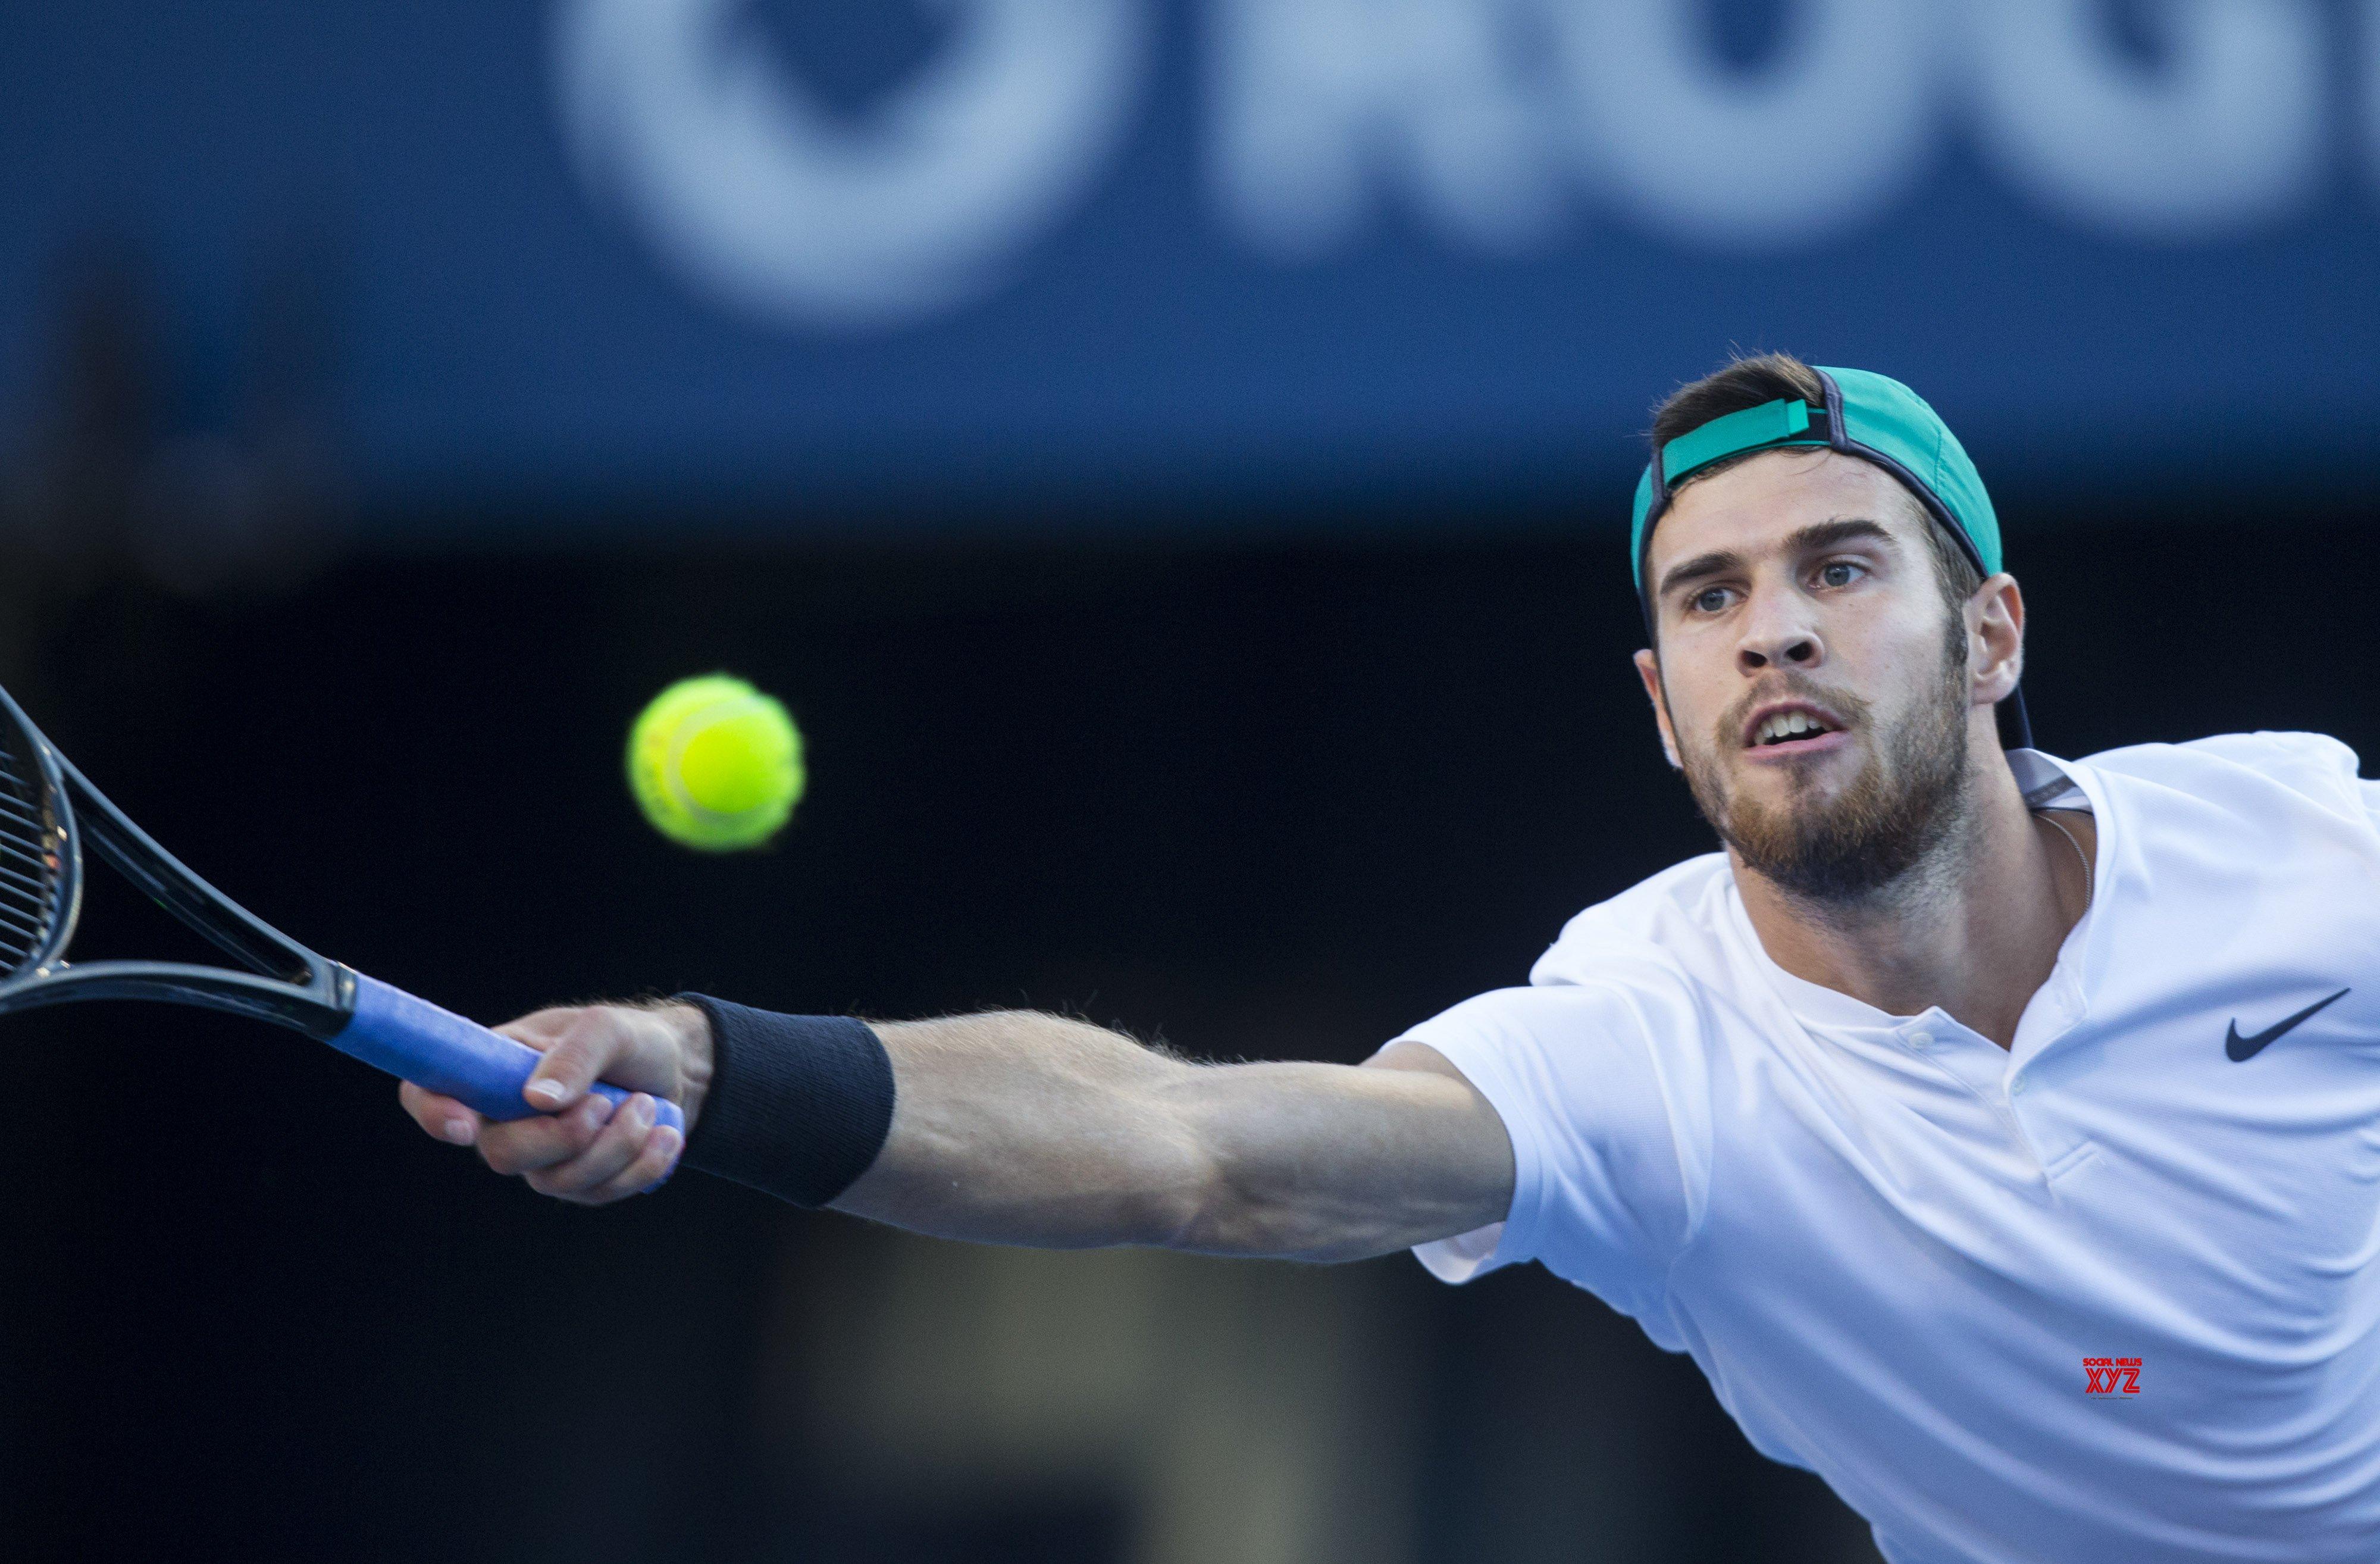 Australian Kyrgios smashes racquets after Cincinnati loss